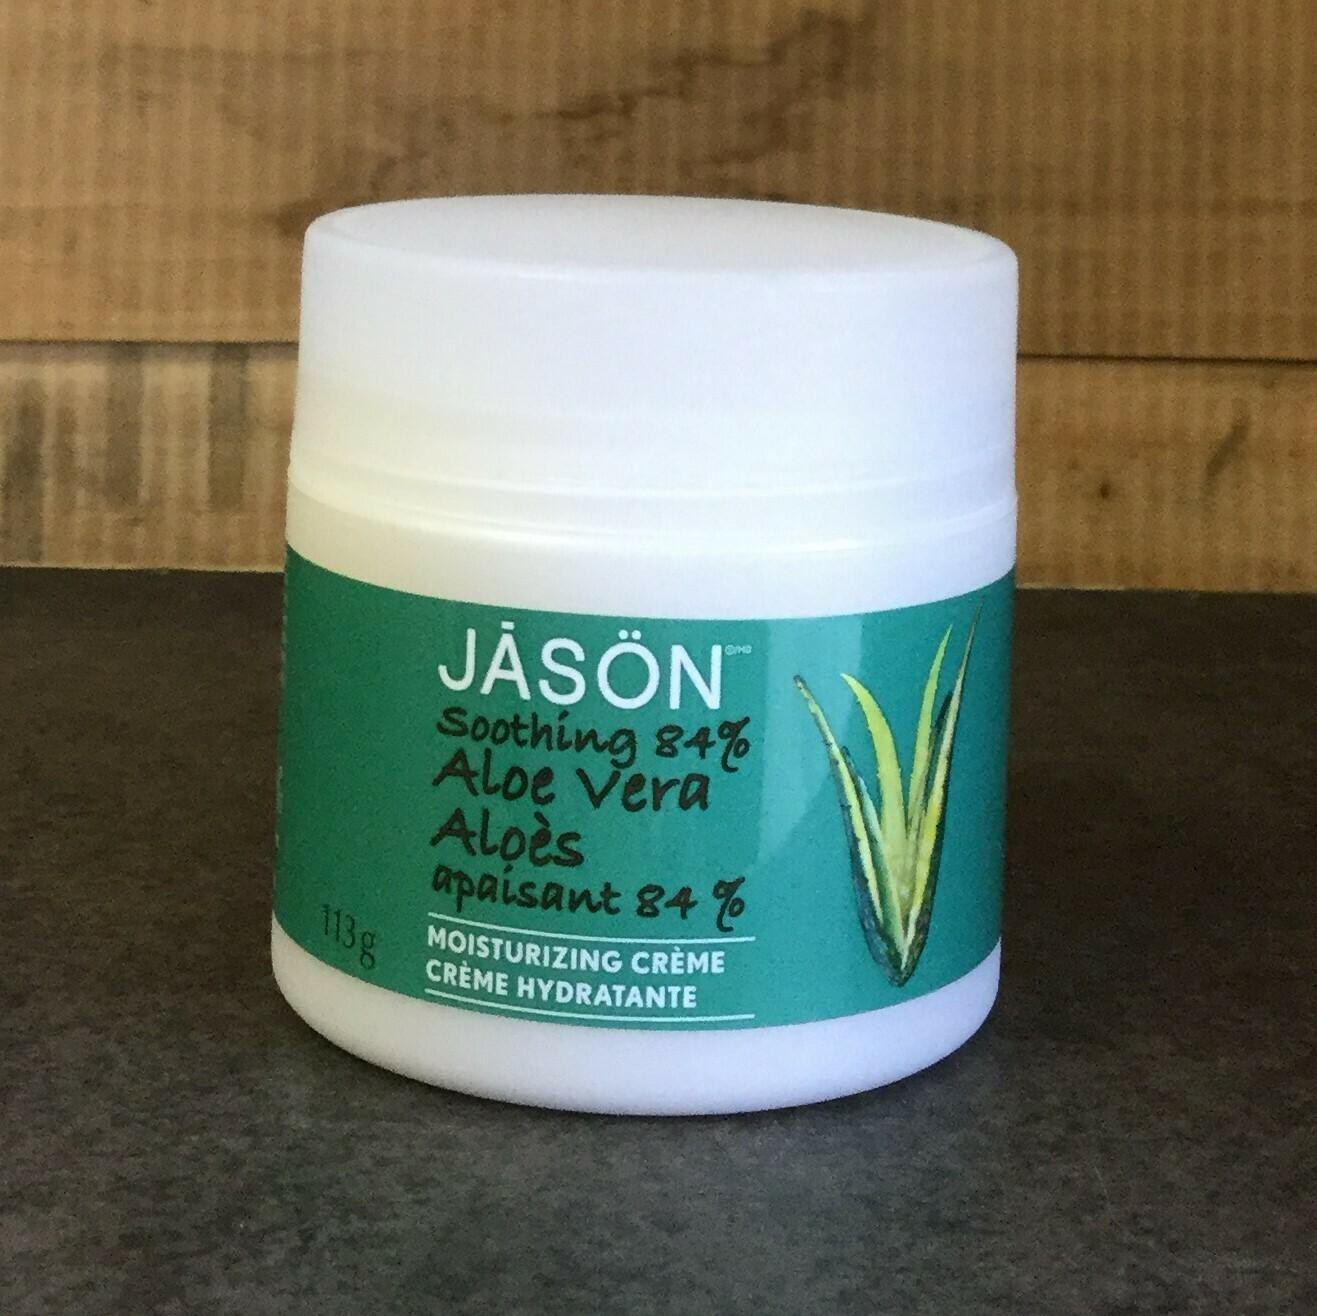 JASON Aloe Vera 84% Creme